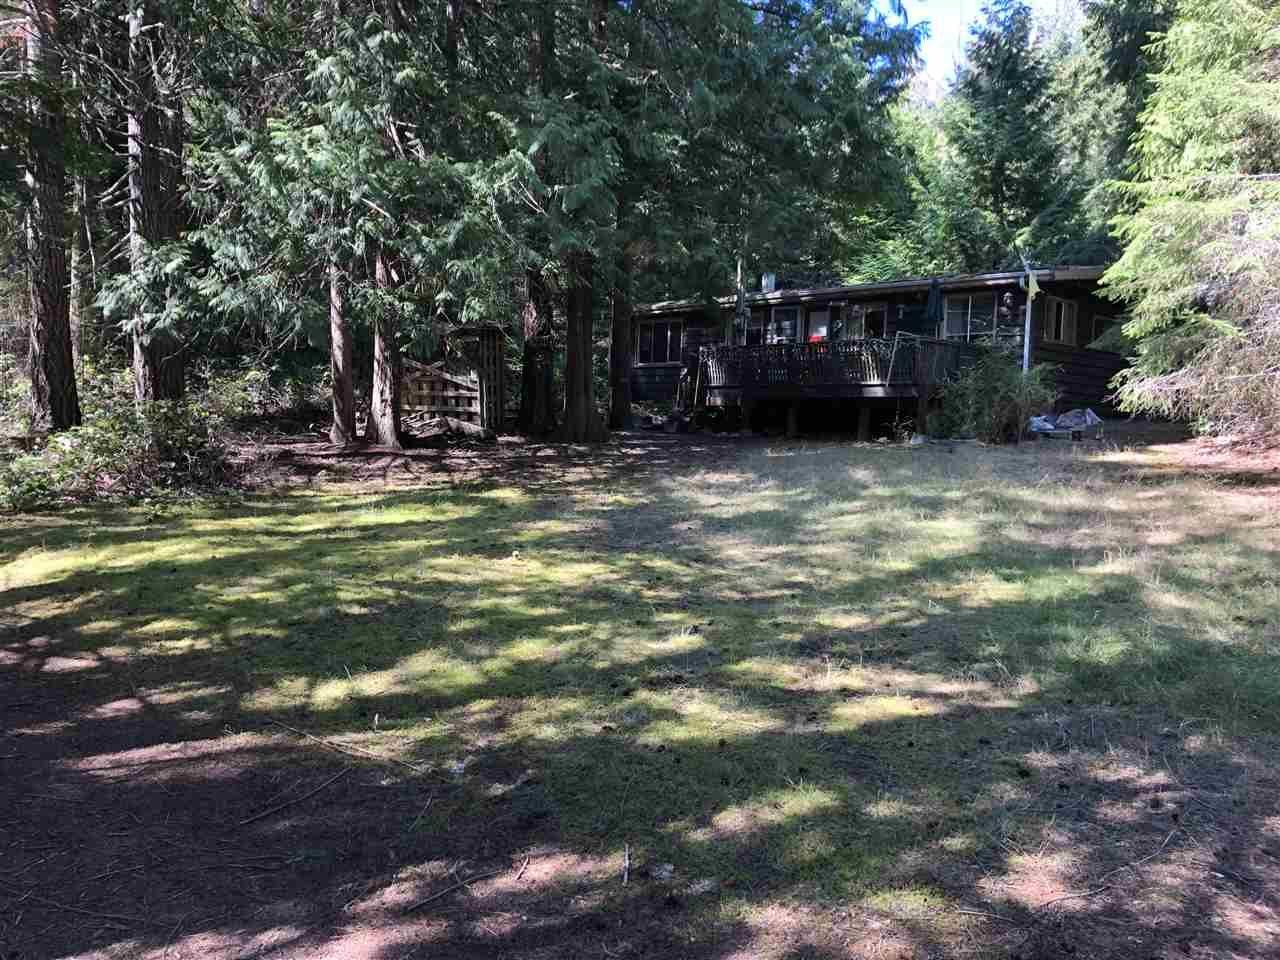 Main Photo: 517 ABBOTT Road: Mayne Island Manufactured Home for sale (Islands-Van. & Gulf)  : MLS®# R2494188